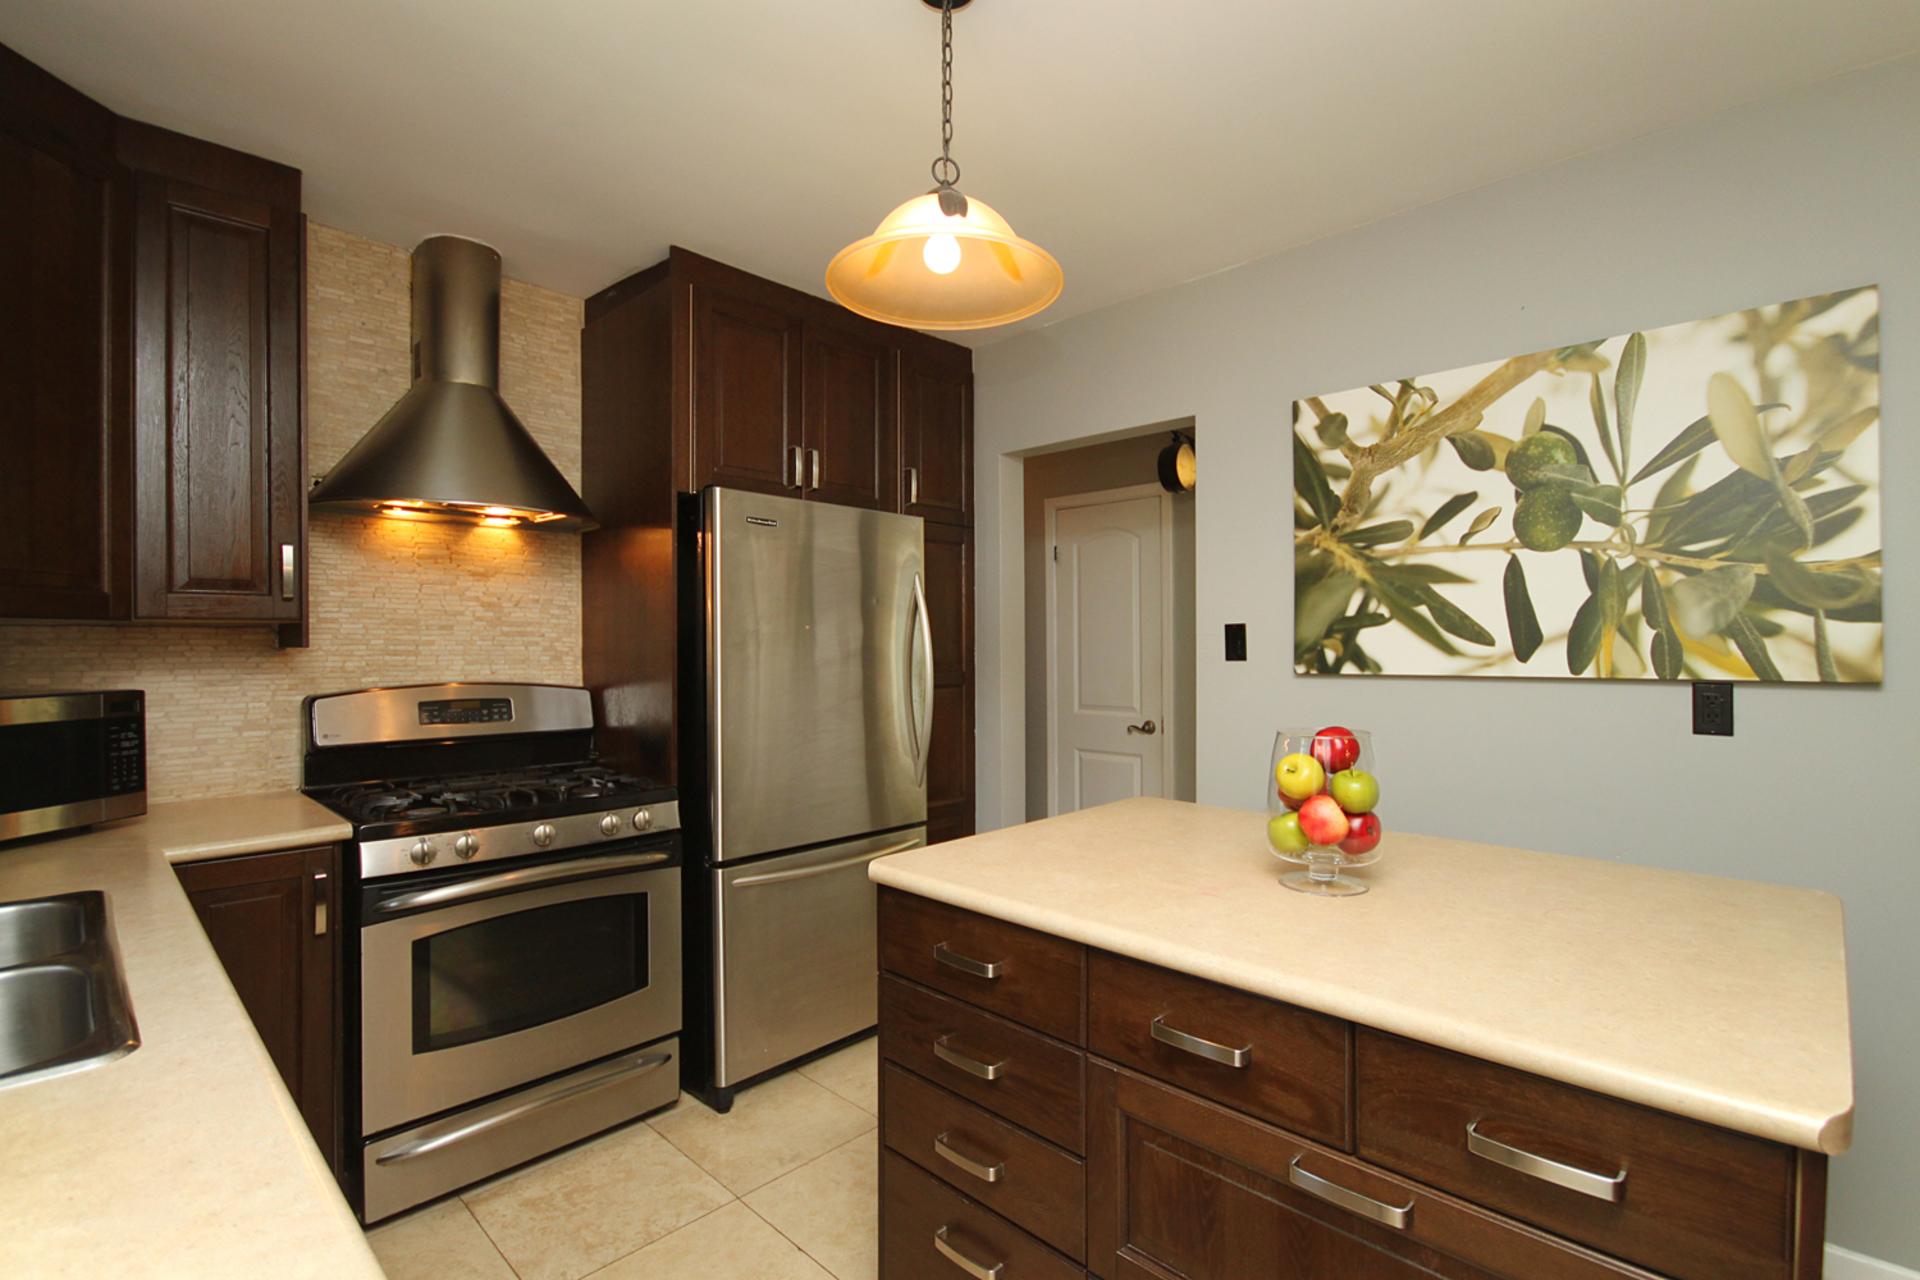 Kitchen at 8 Dukinfield Crescent, Parkwoods-Donalda, Toronto